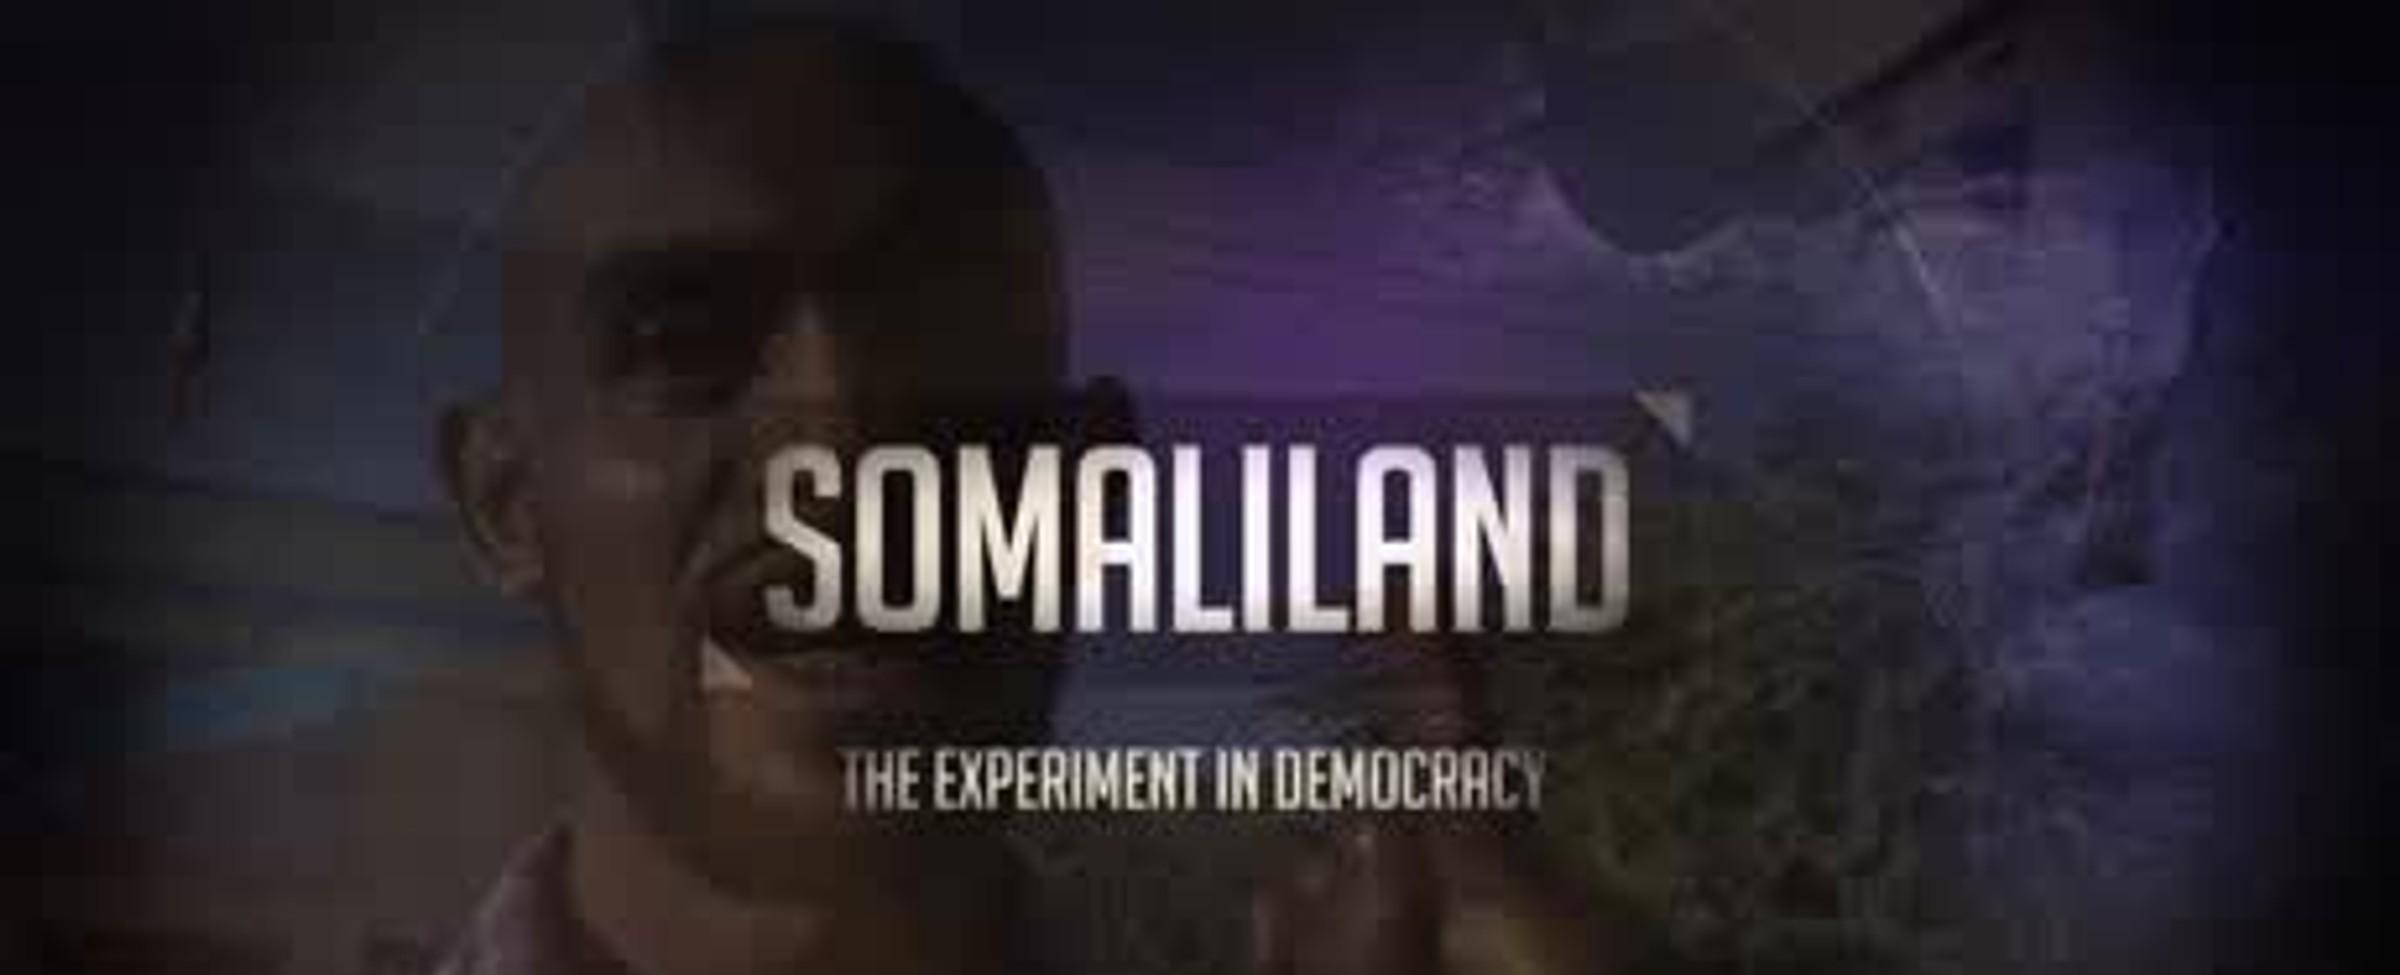 Somálijsko - demokratický experiment